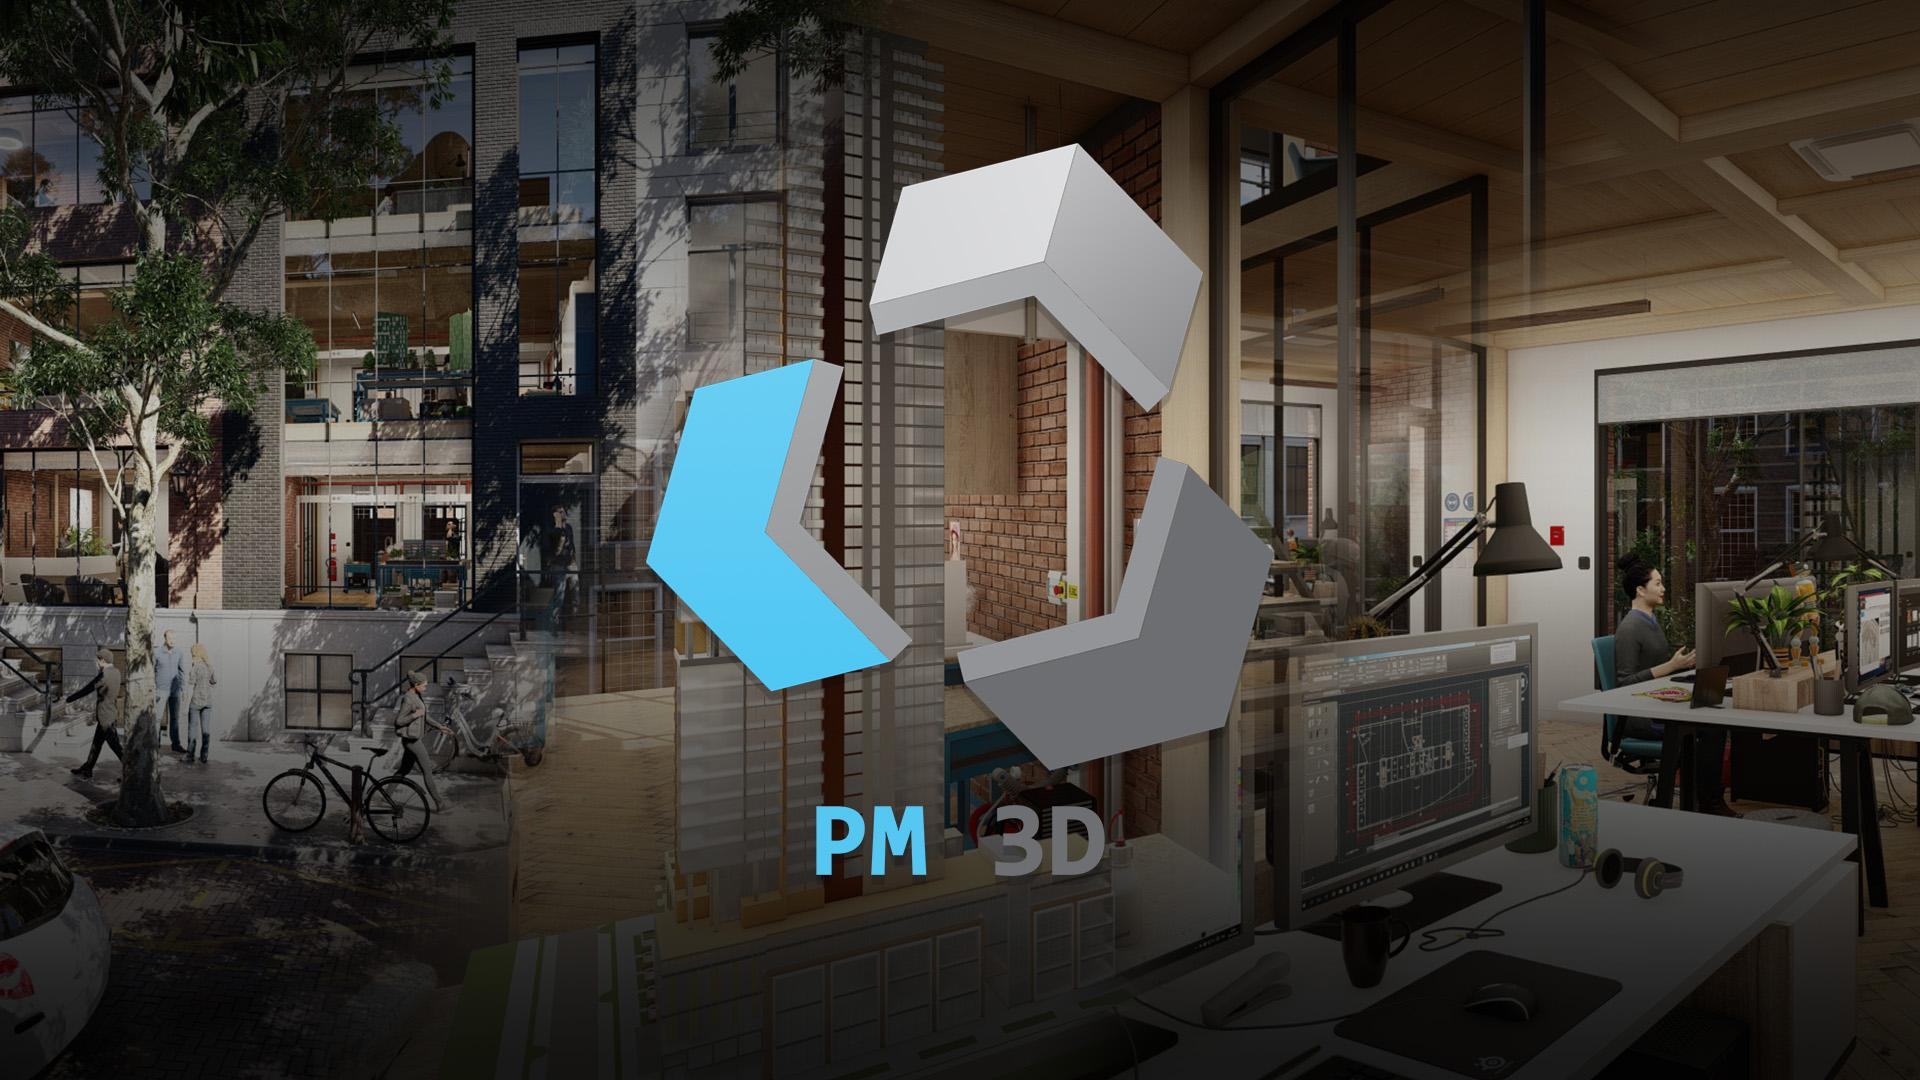 Ateliers PM 3D